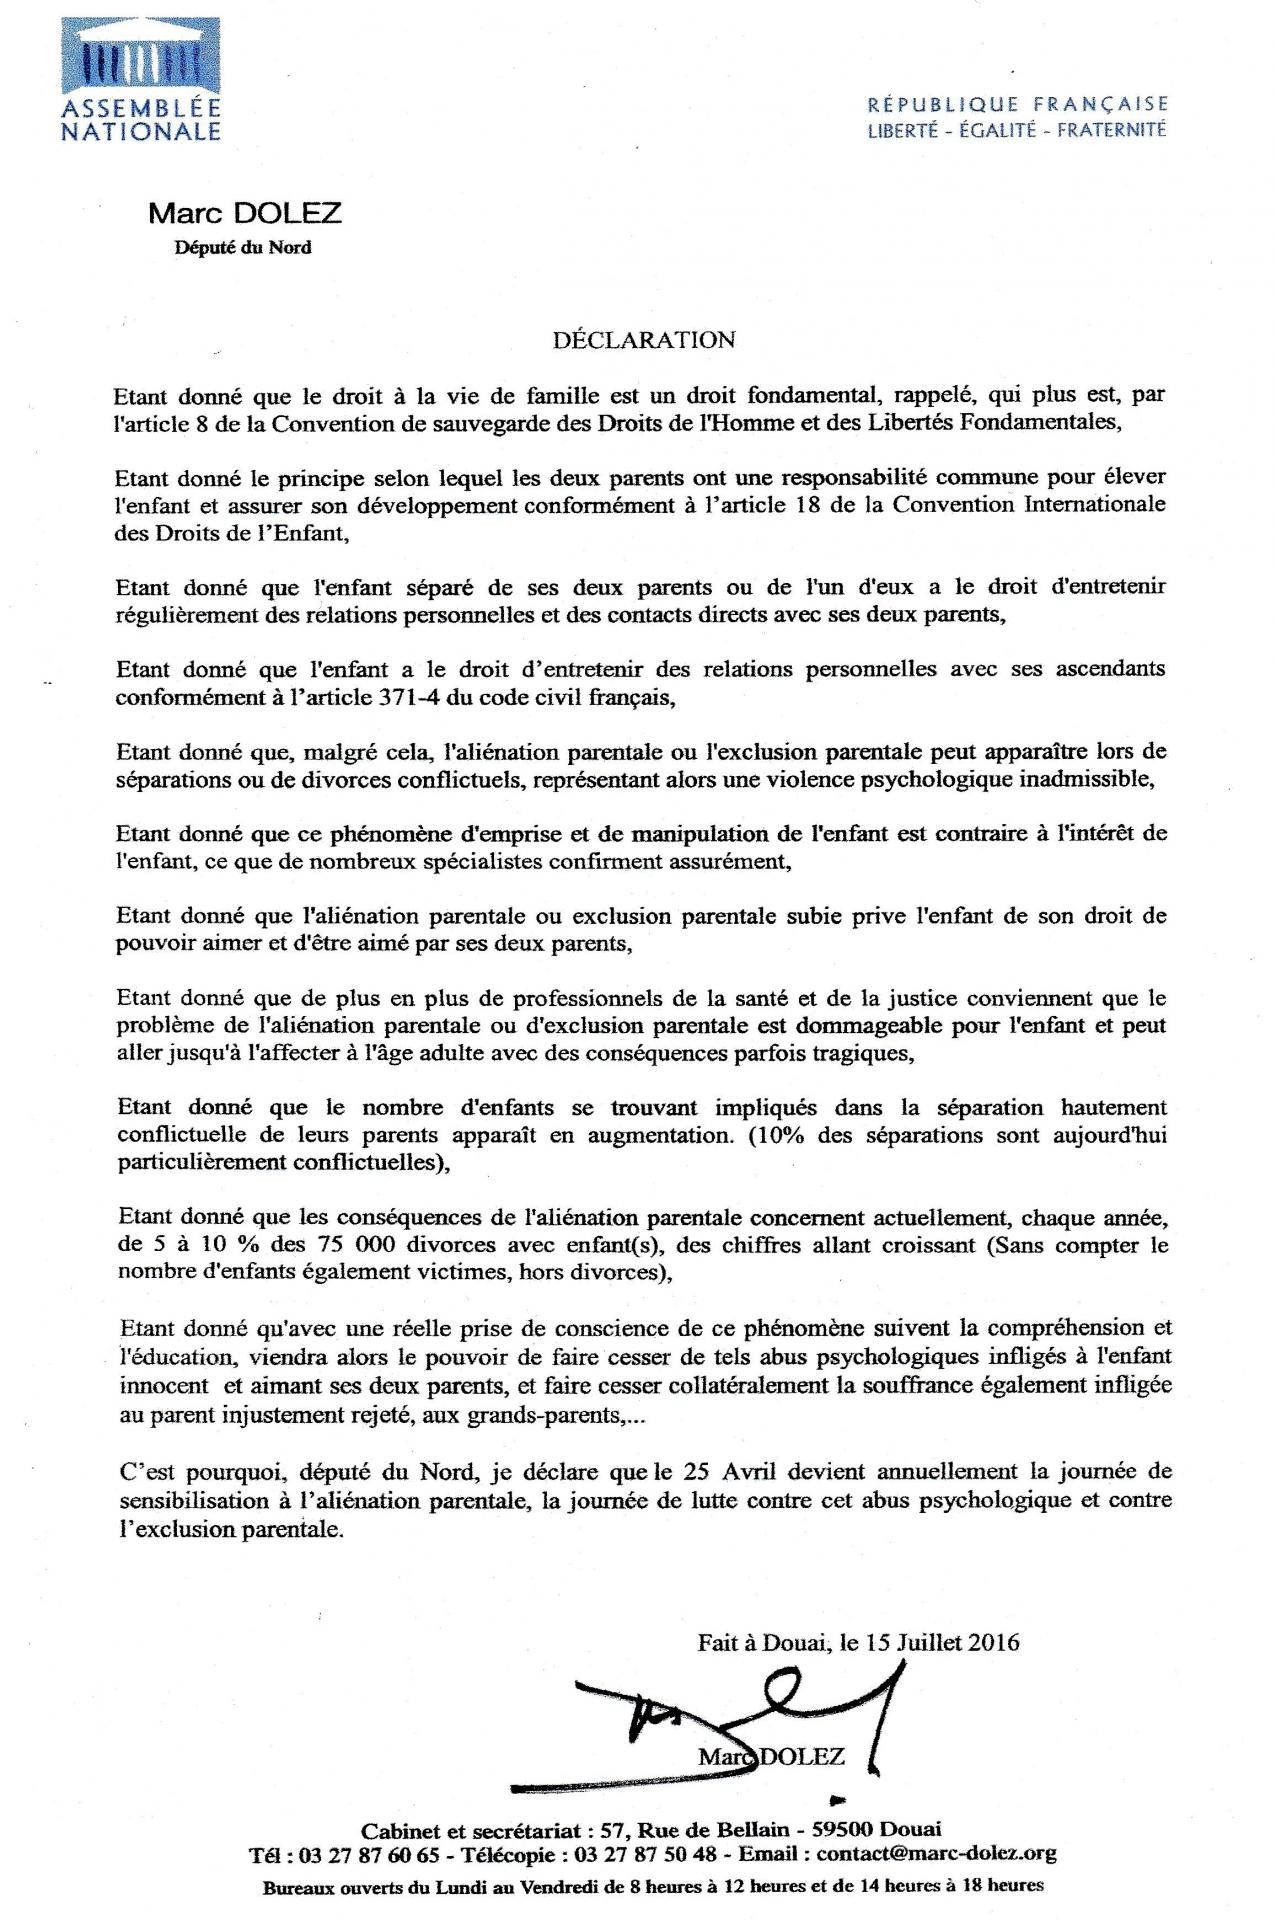 Declaration dolez n 6 parliament member